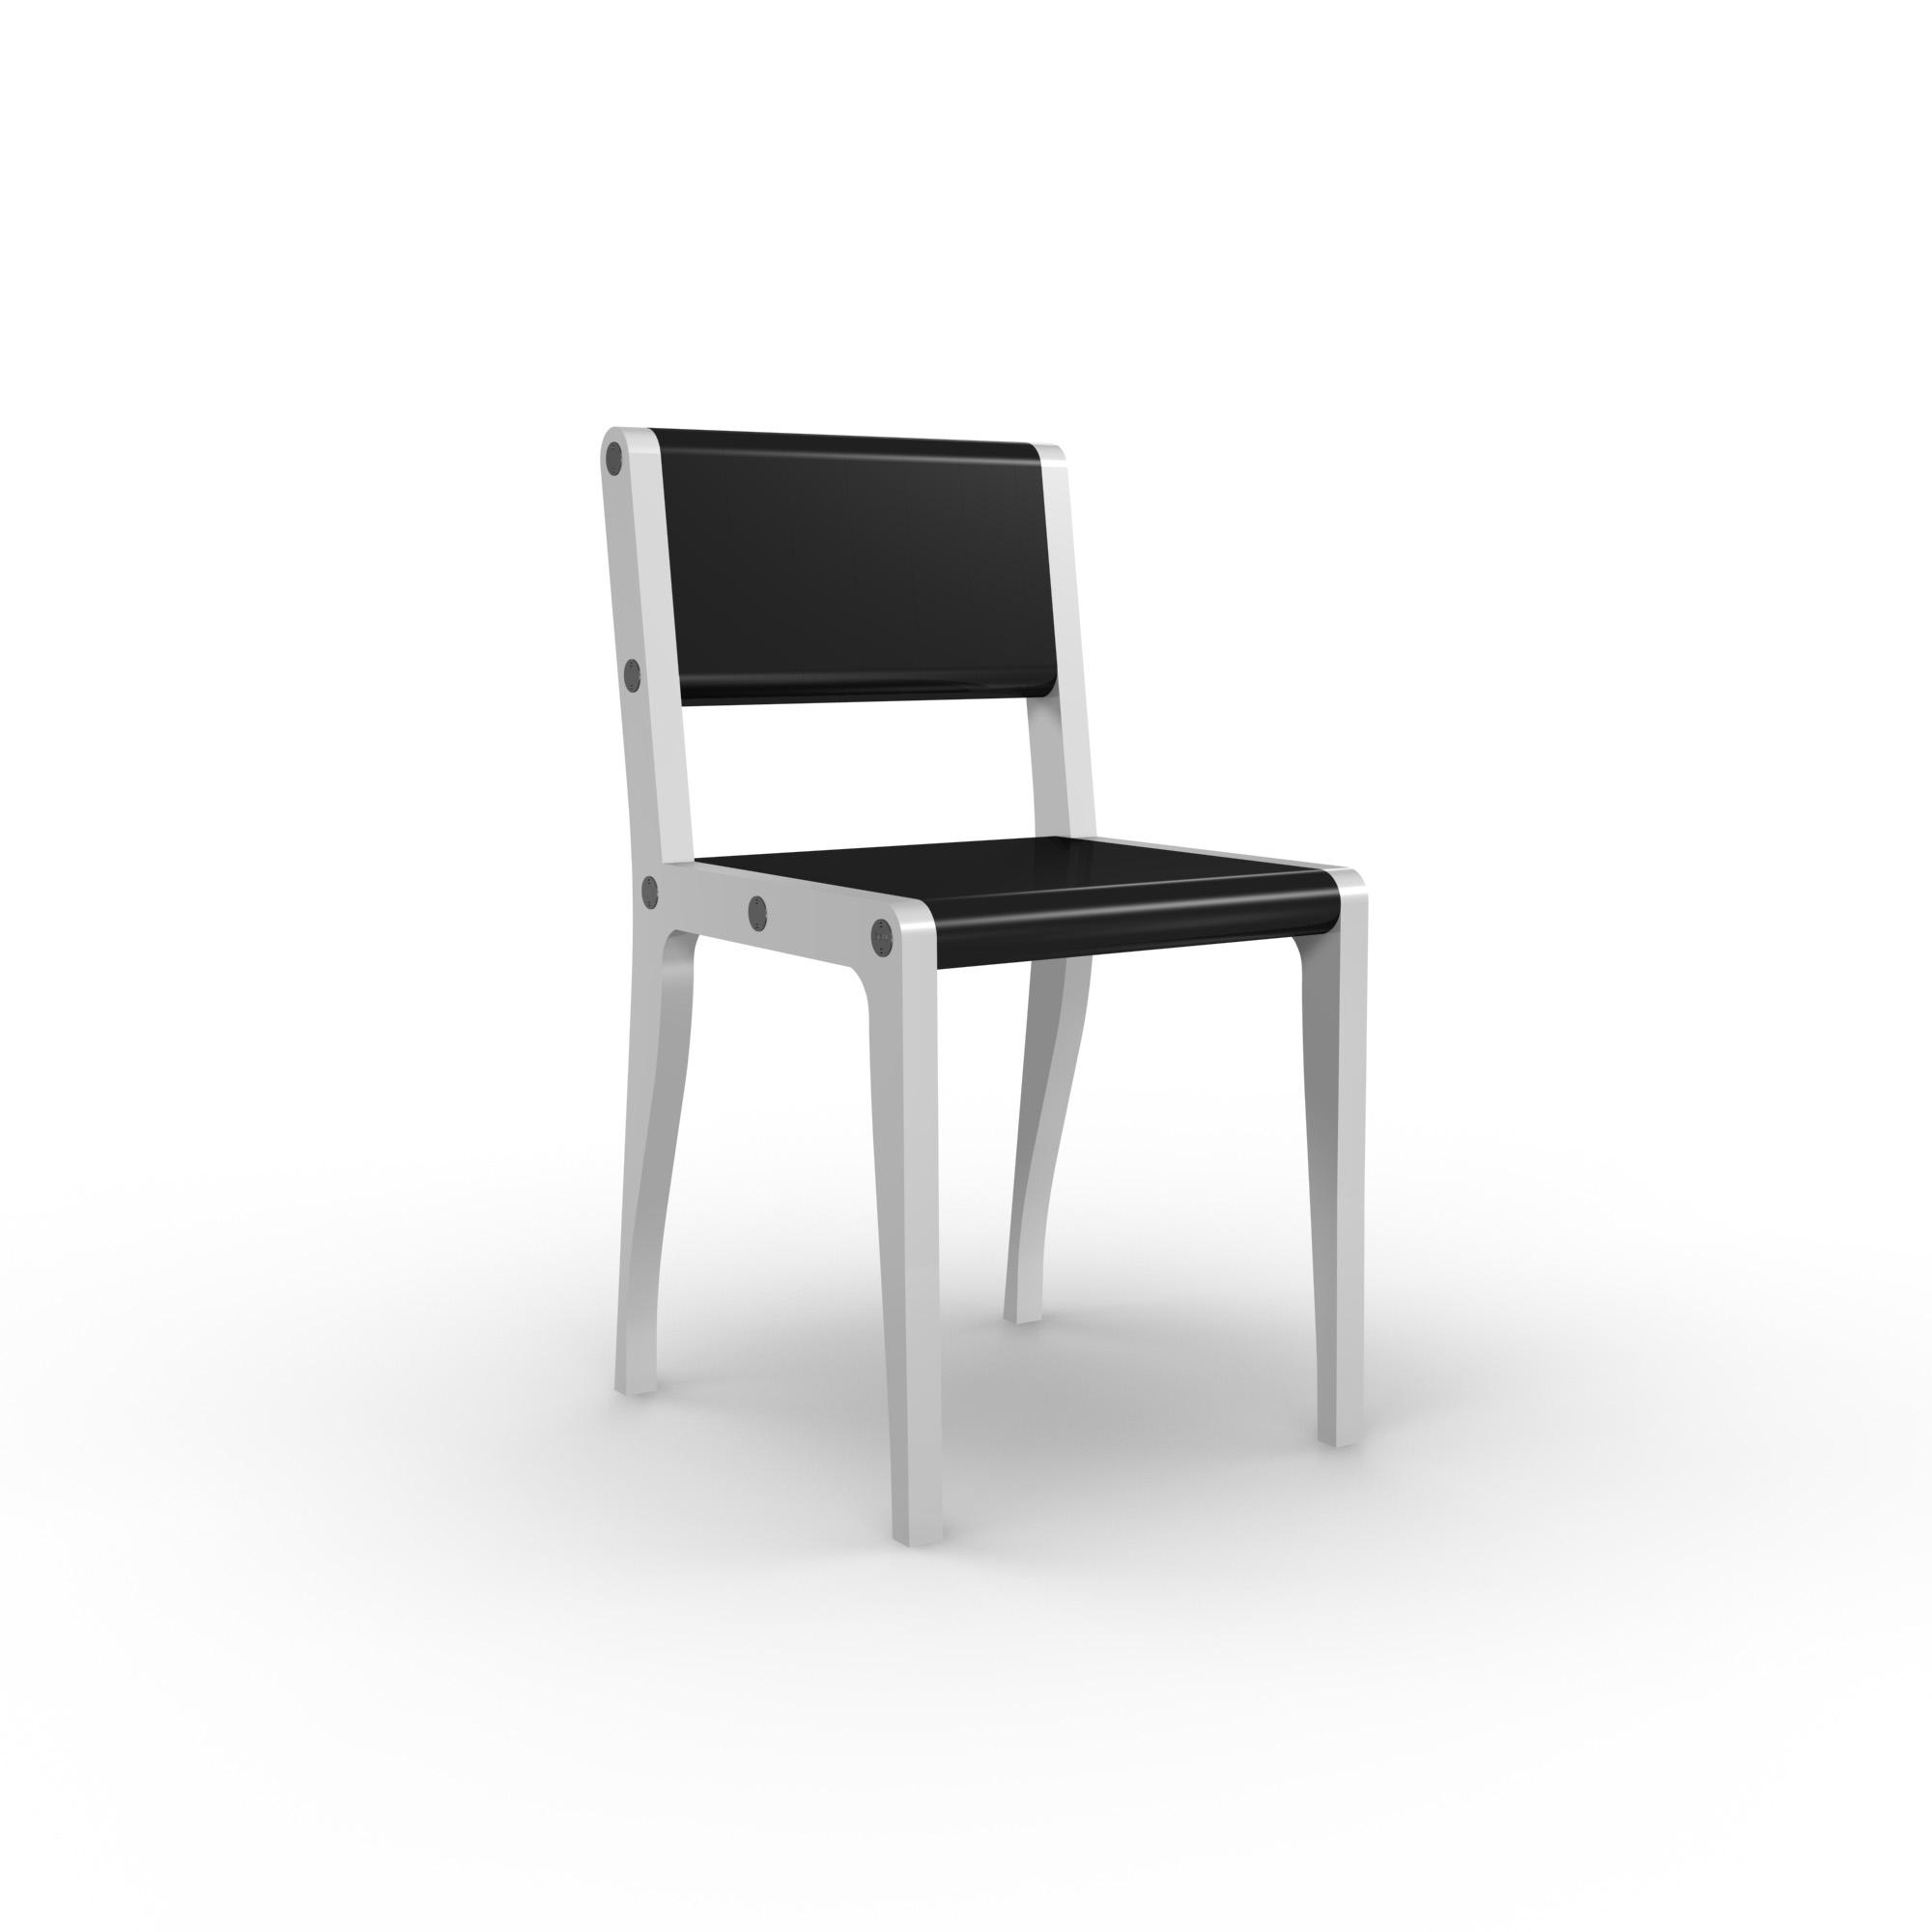 diseño industrial santander - Beusual - Sirak - silla black and white